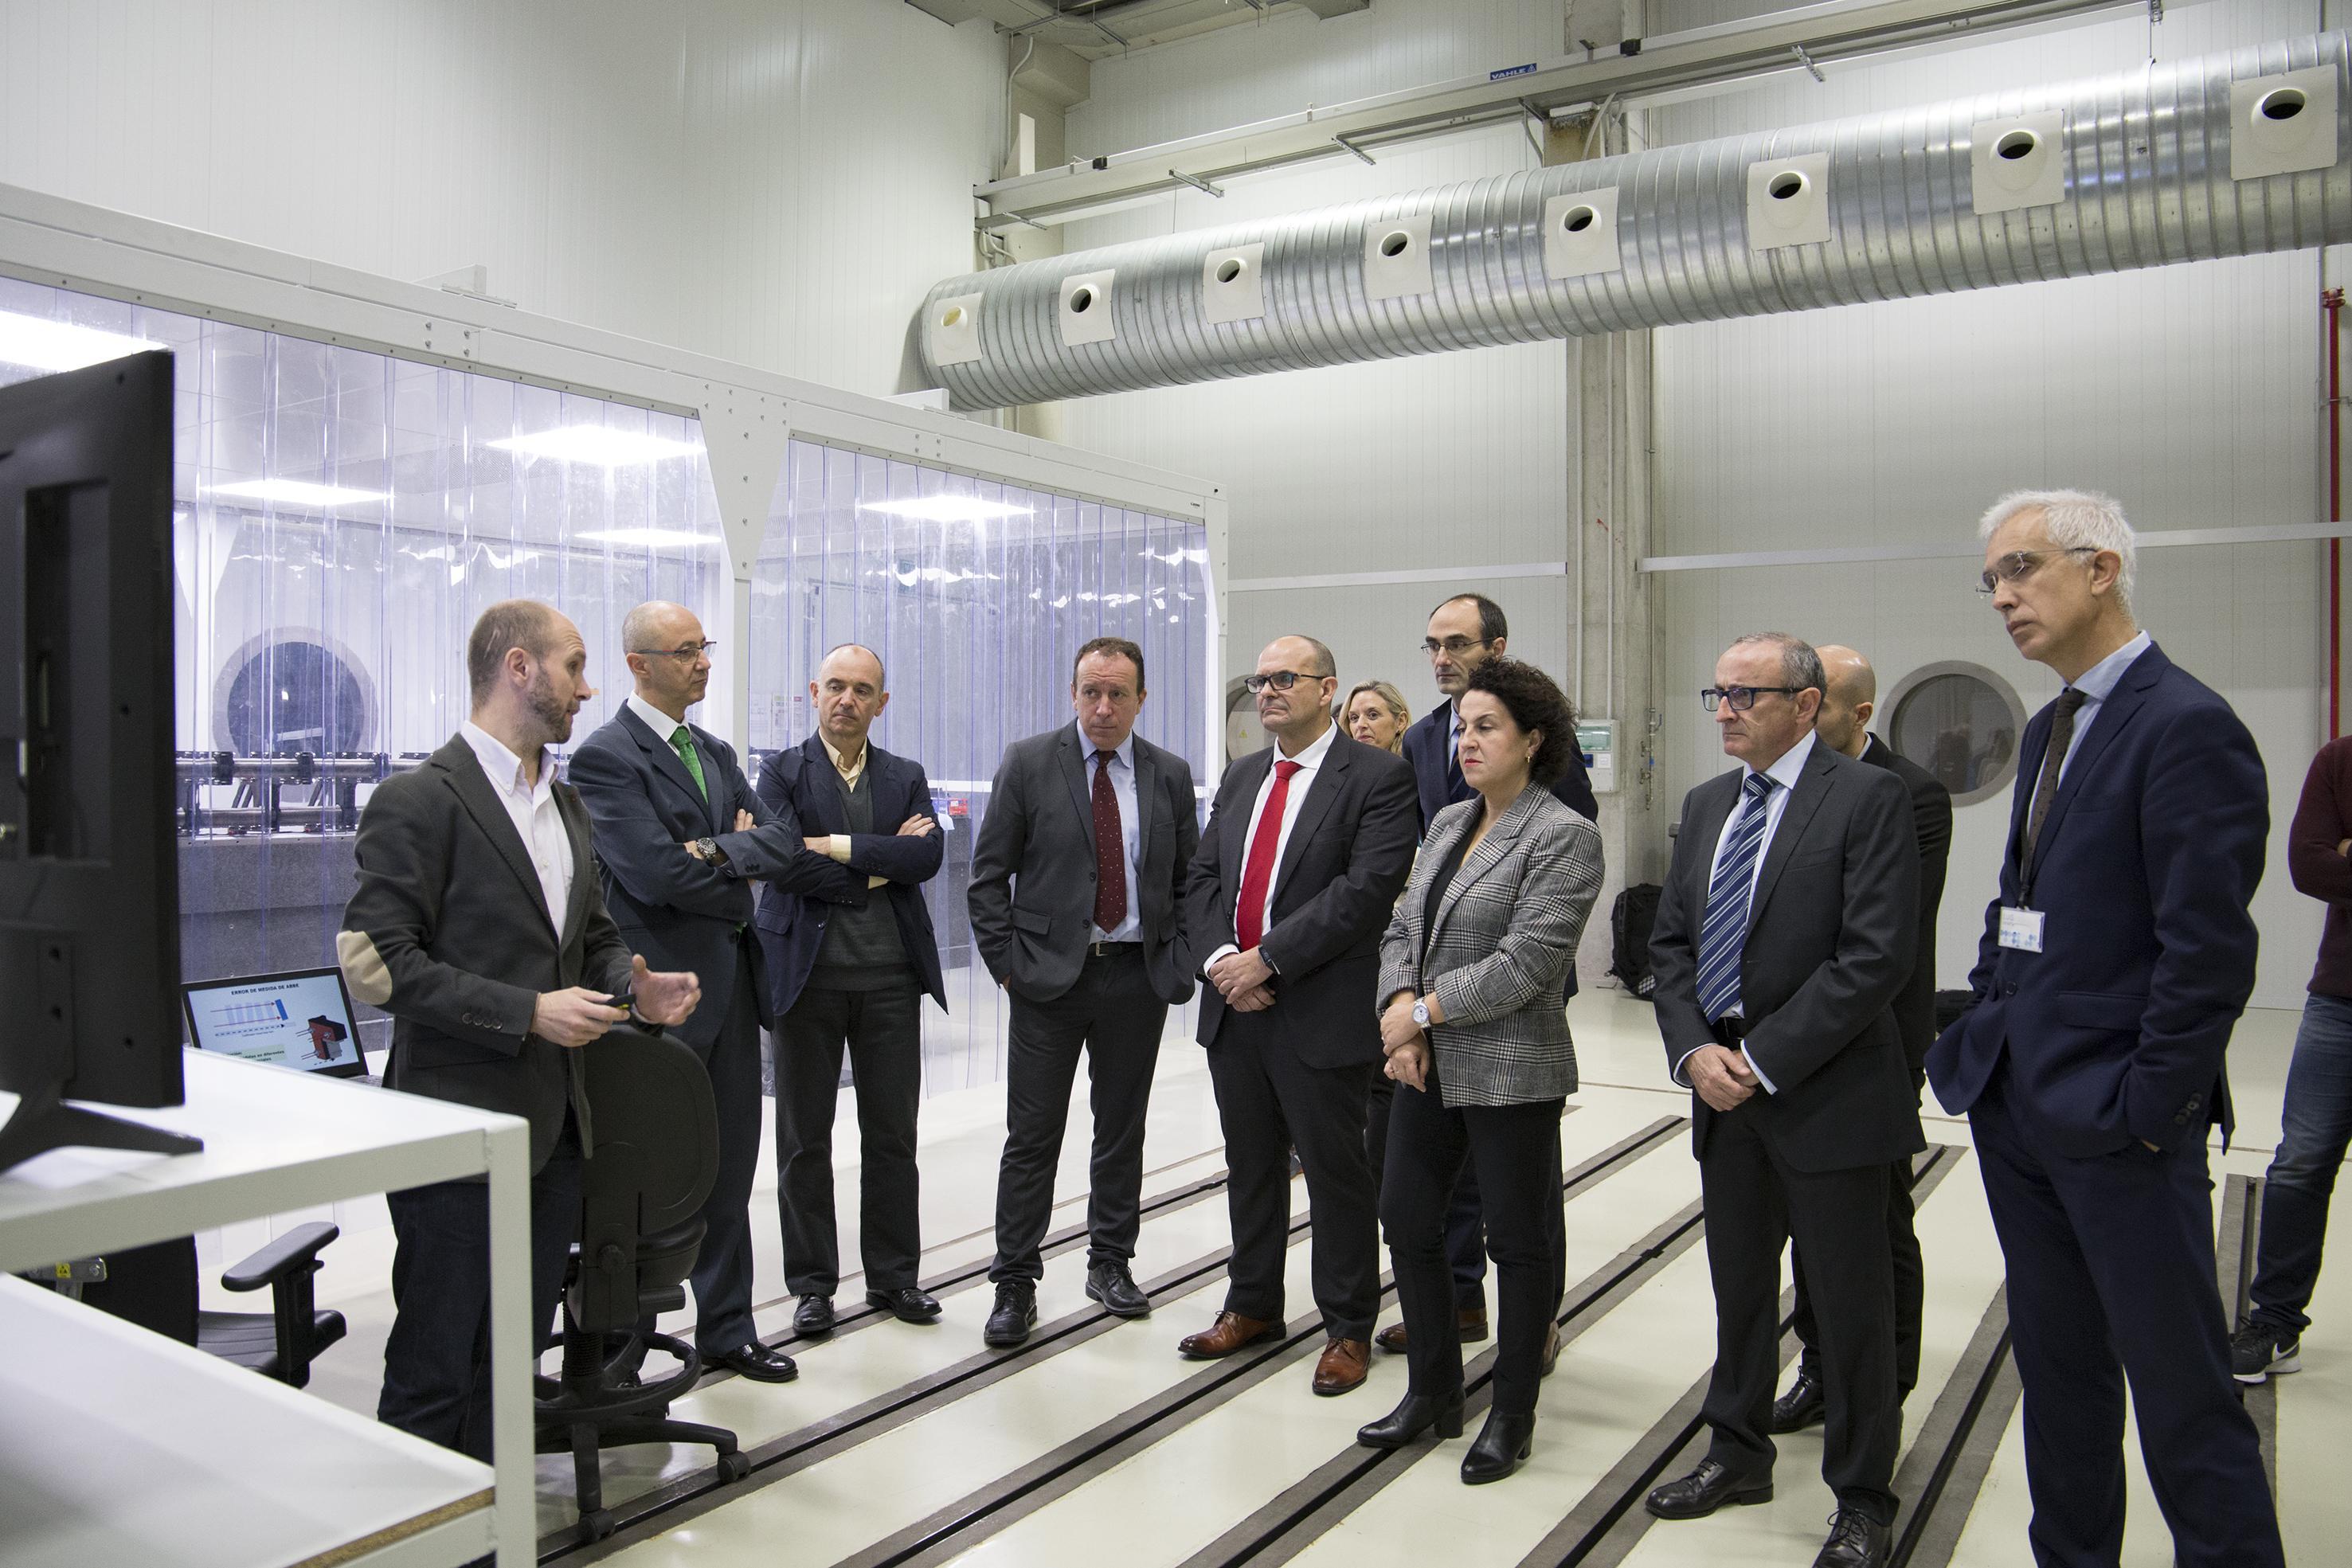 Fagor Automation e IK4-TEKNIKER presentan un innovador banco de pruebas de calibración nanométrica